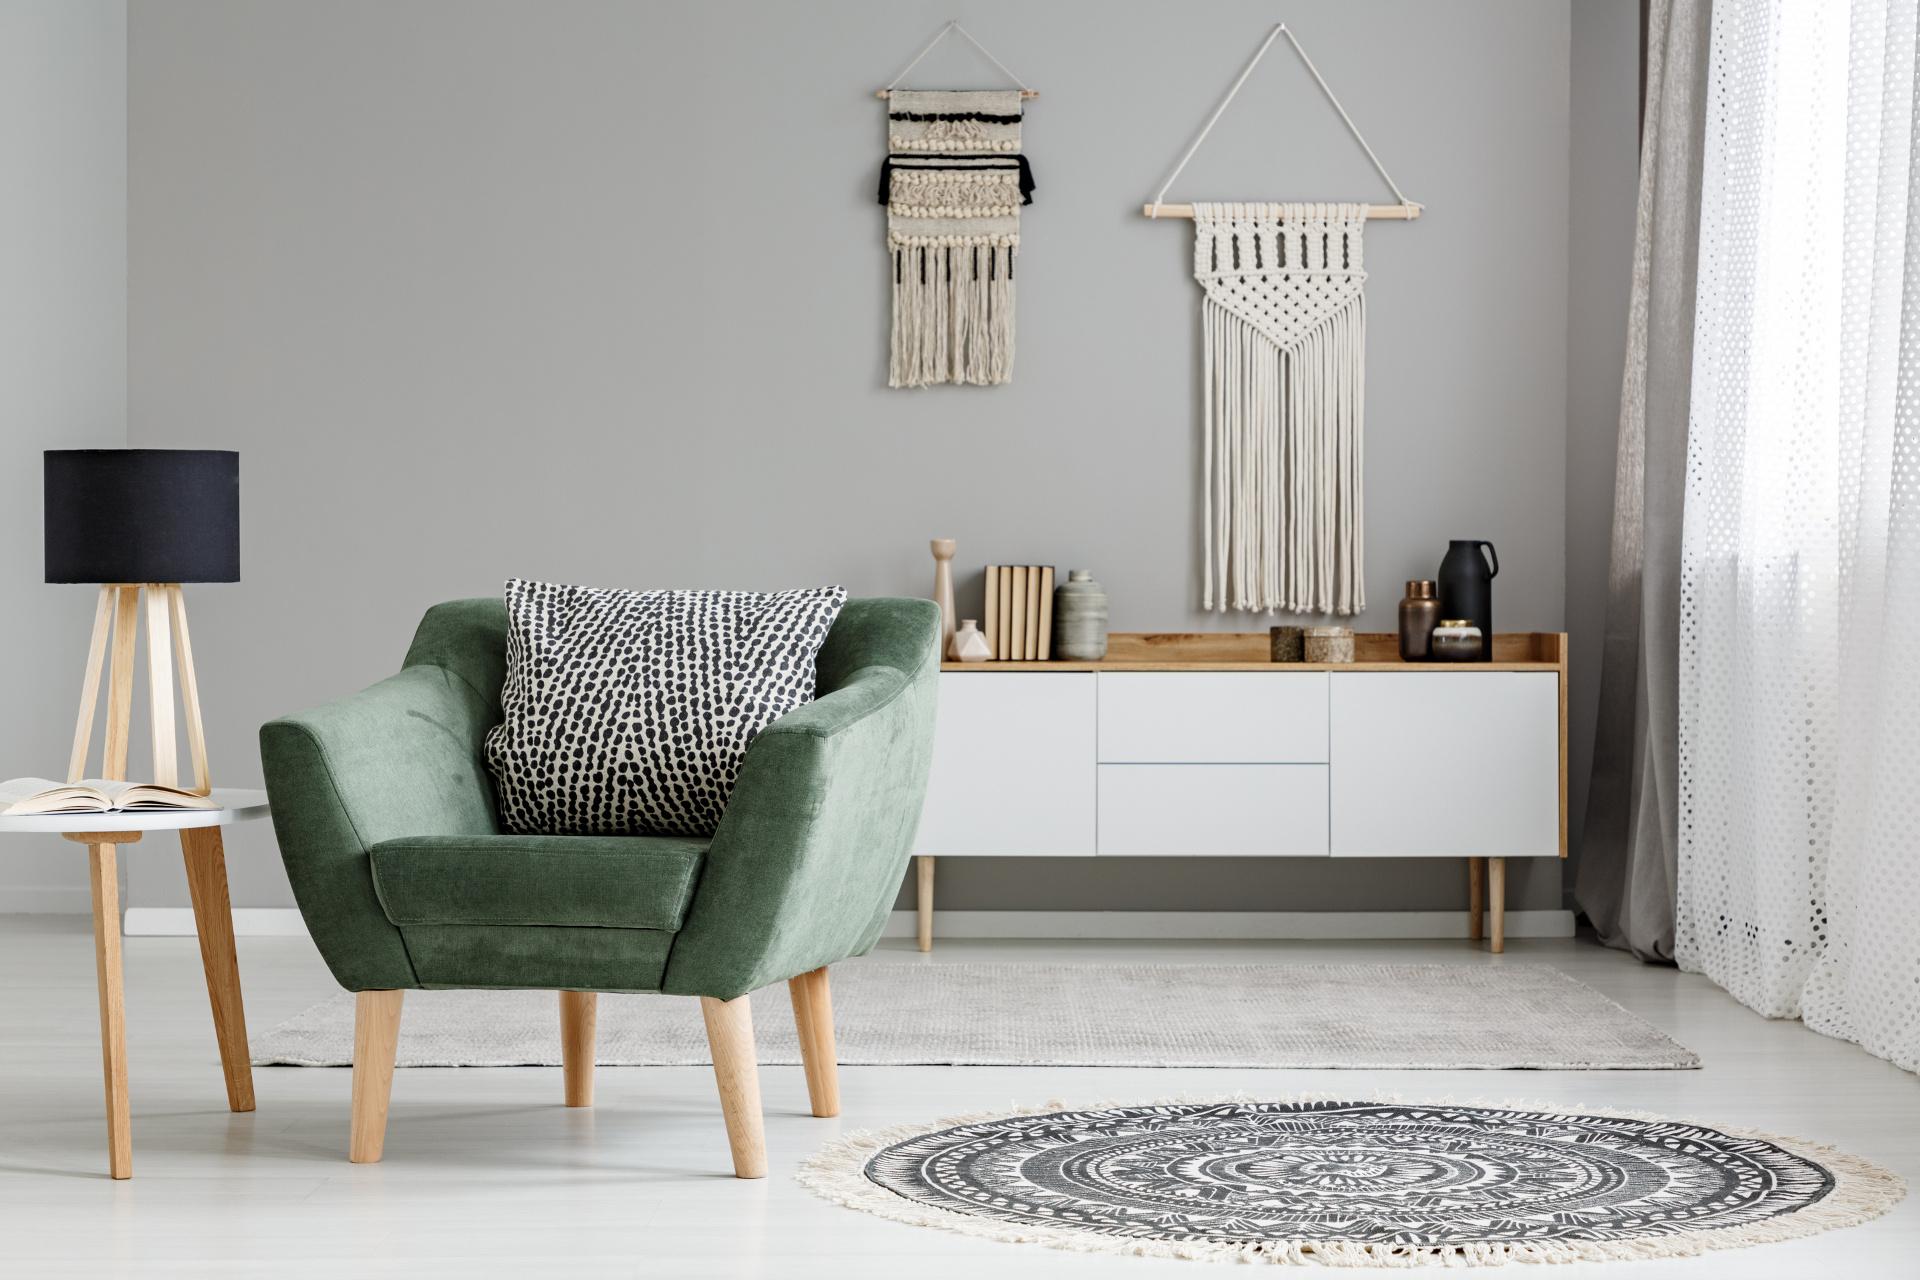 was ist eigentlich makramee sparblog. Black Bedroom Furniture Sets. Home Design Ideas